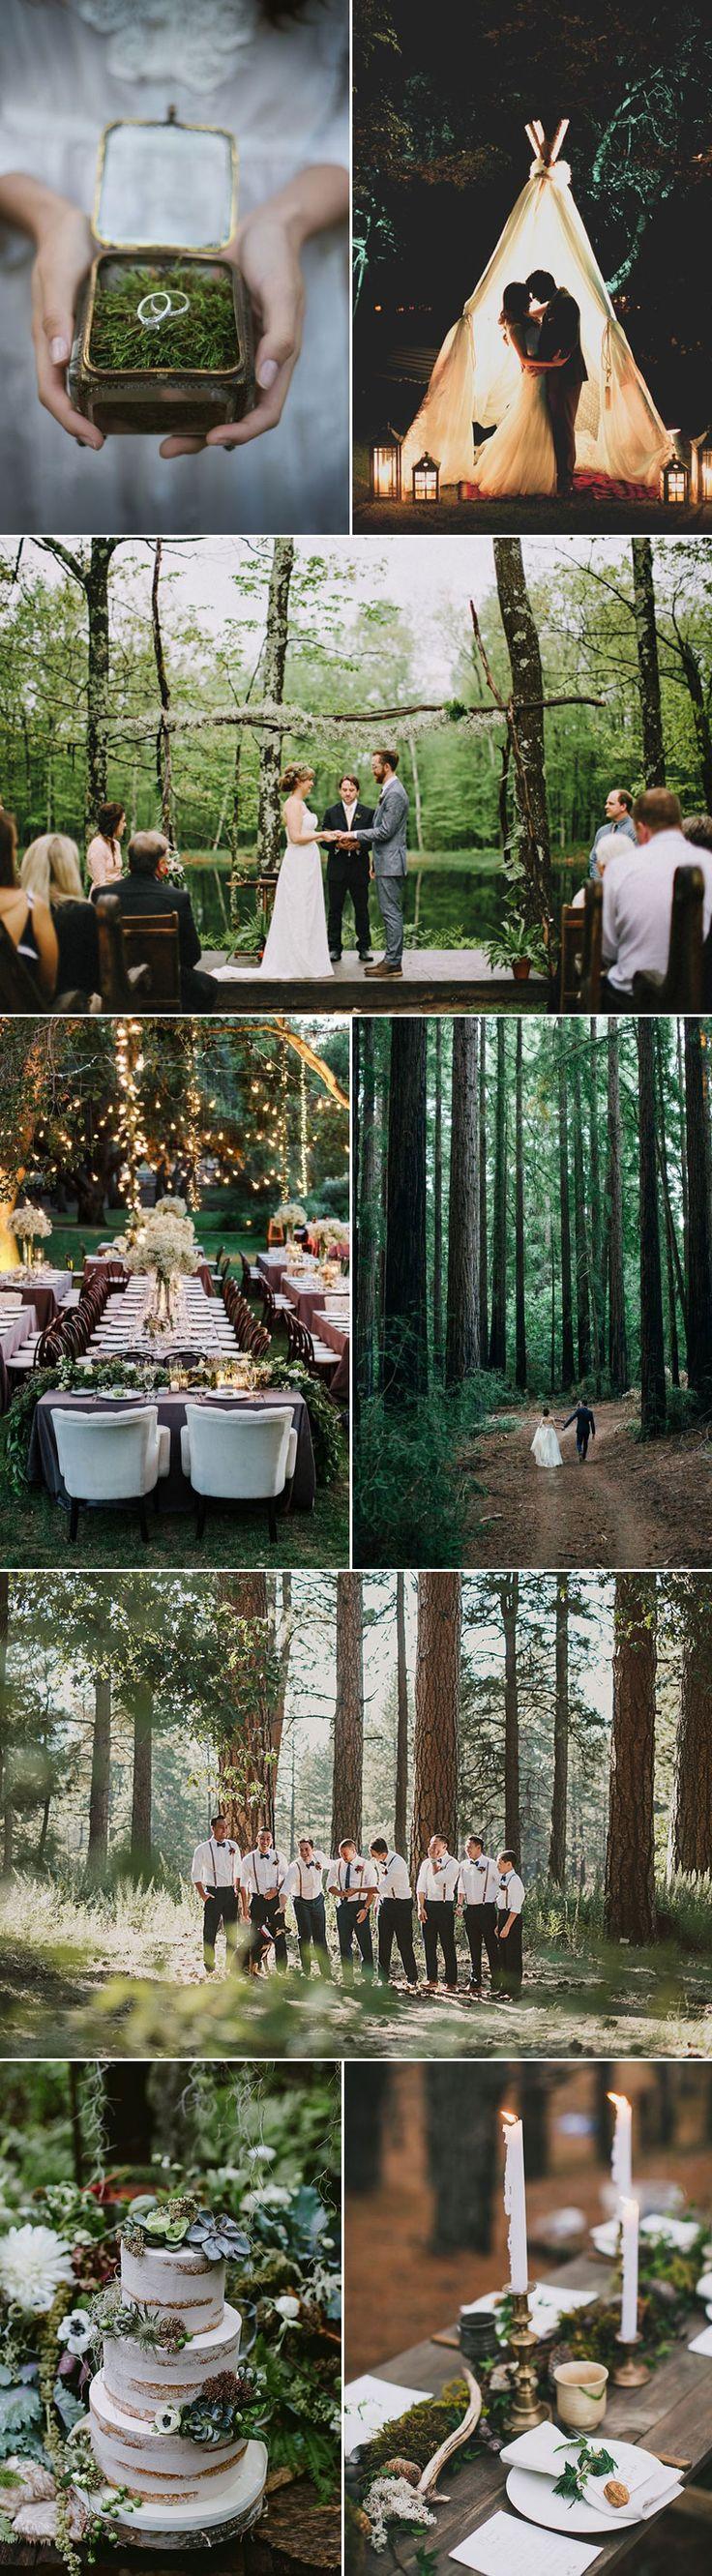 Fall outdoor wedding dresses   best Wedding images on Pinterest  Wedding ideas Weddings and